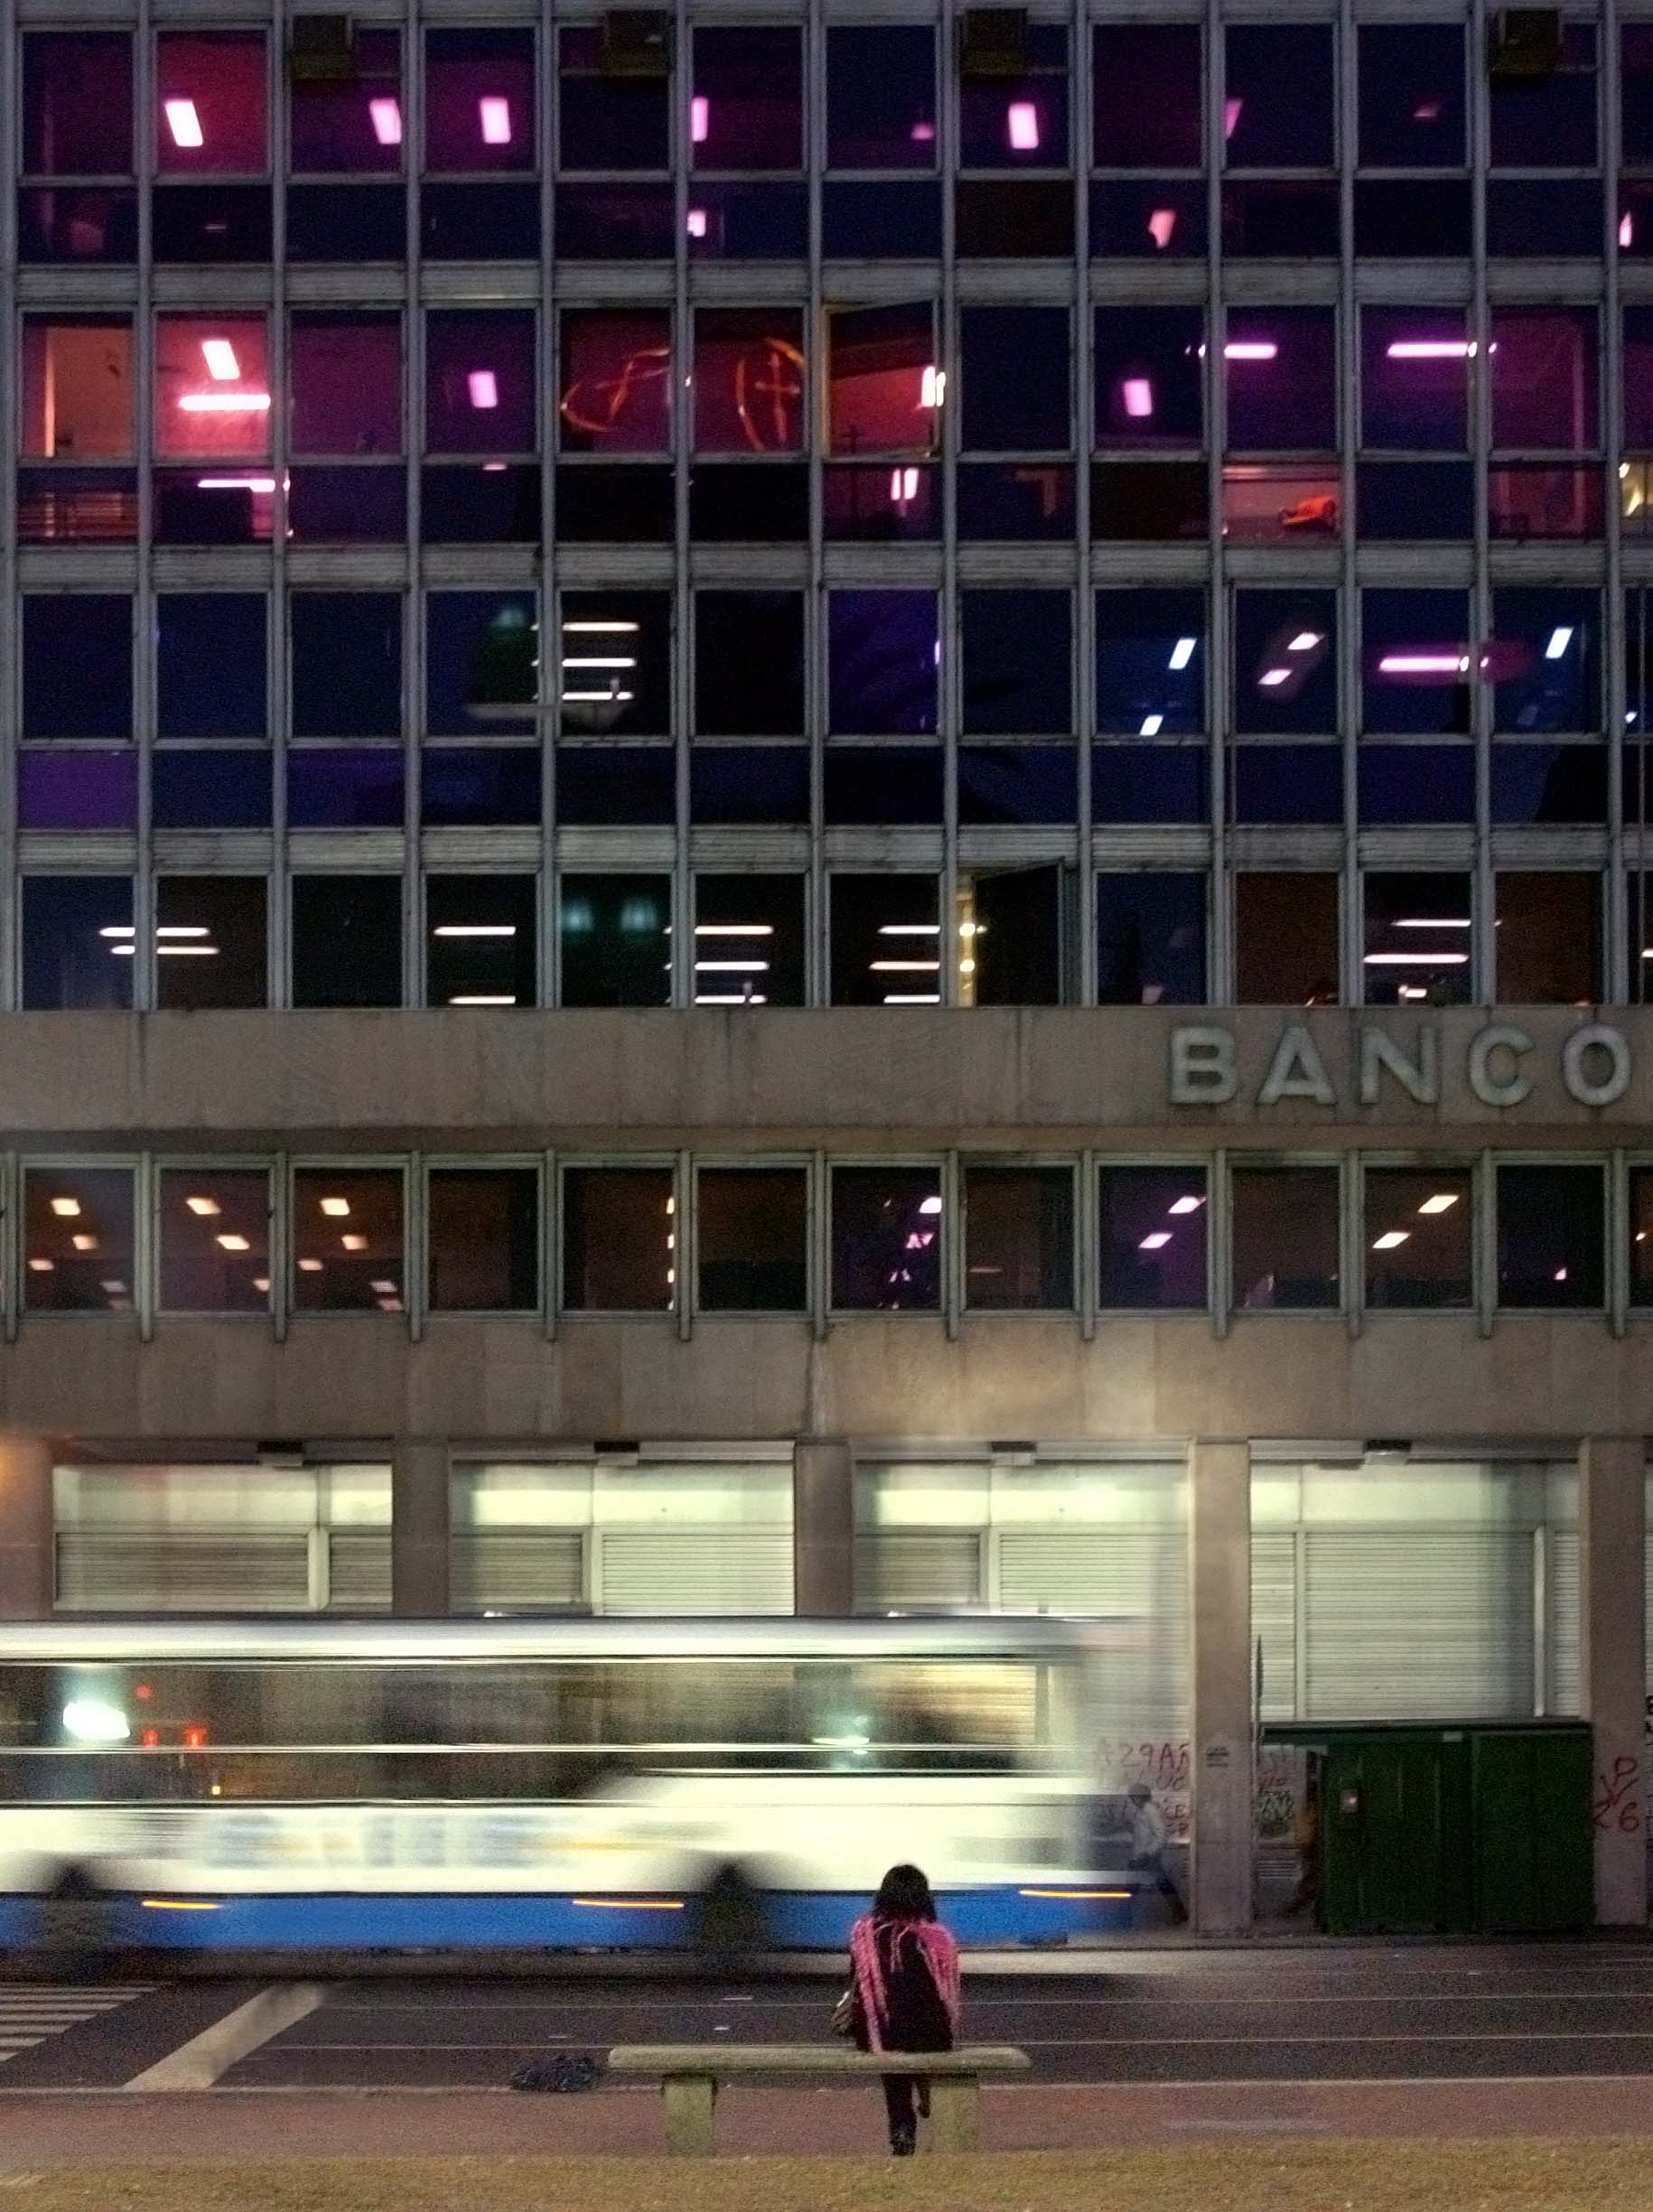 Banco, Beunos Aires